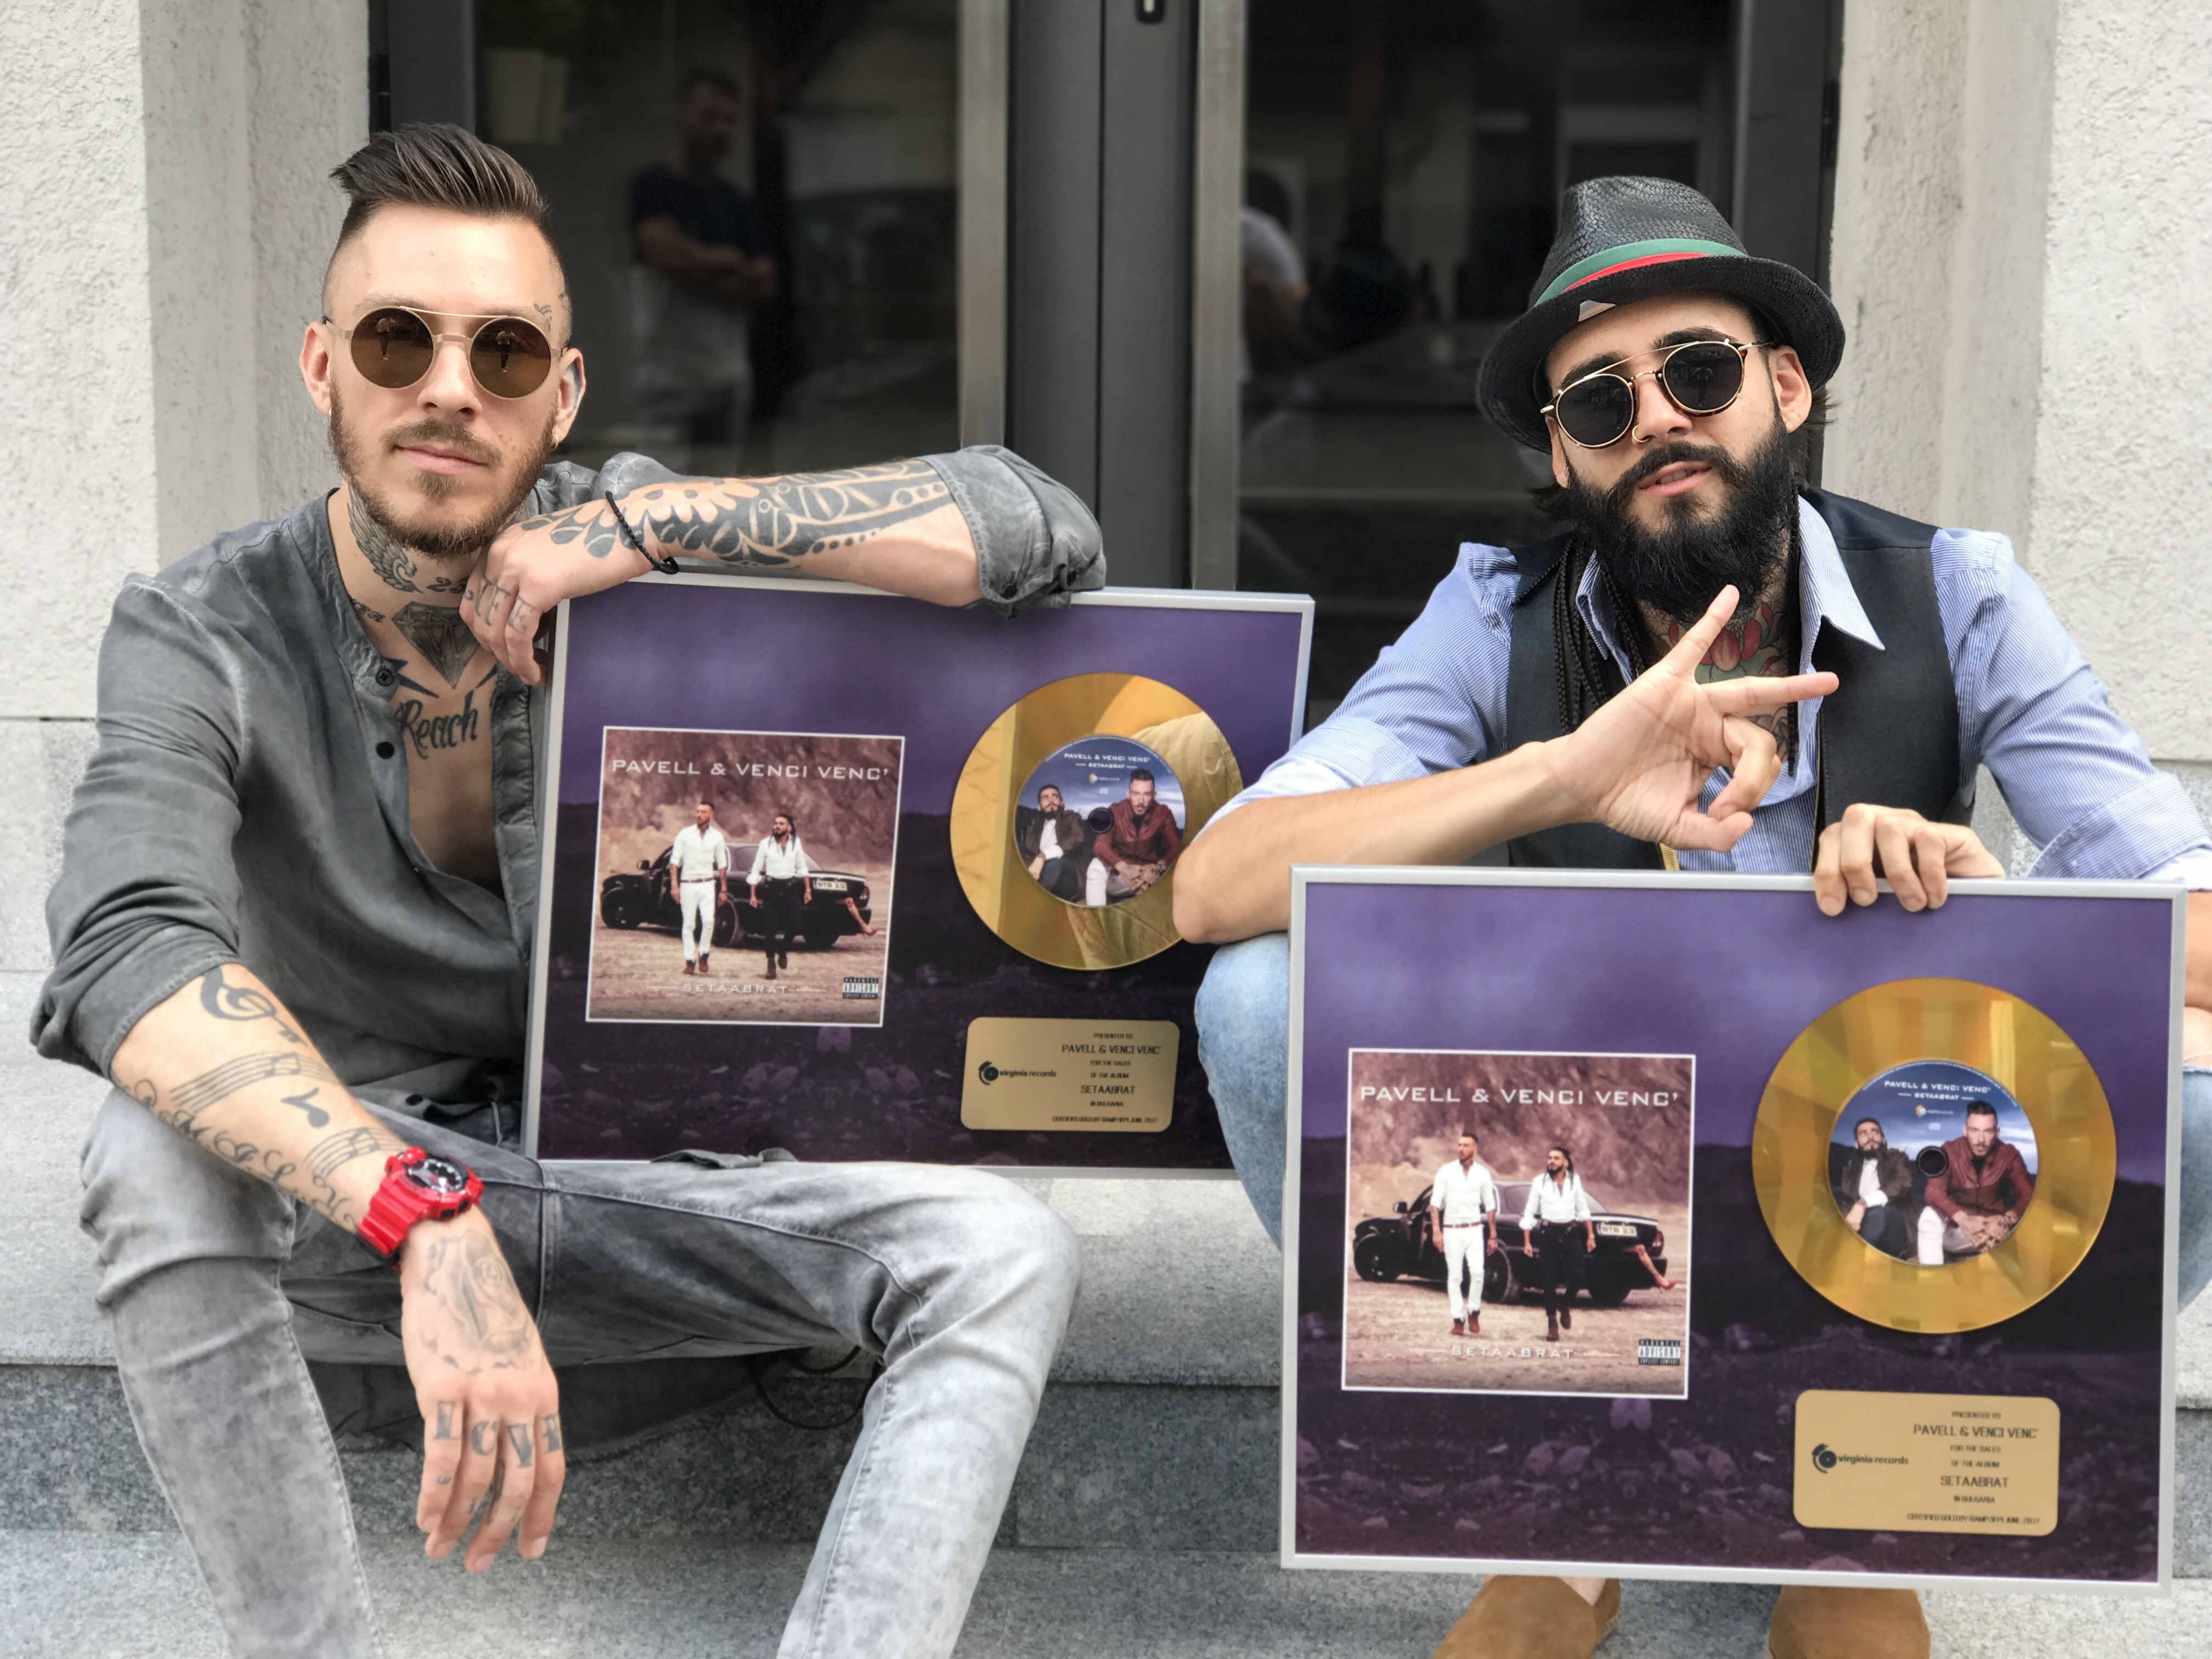 Pavell & Venci Venc' със златен албум